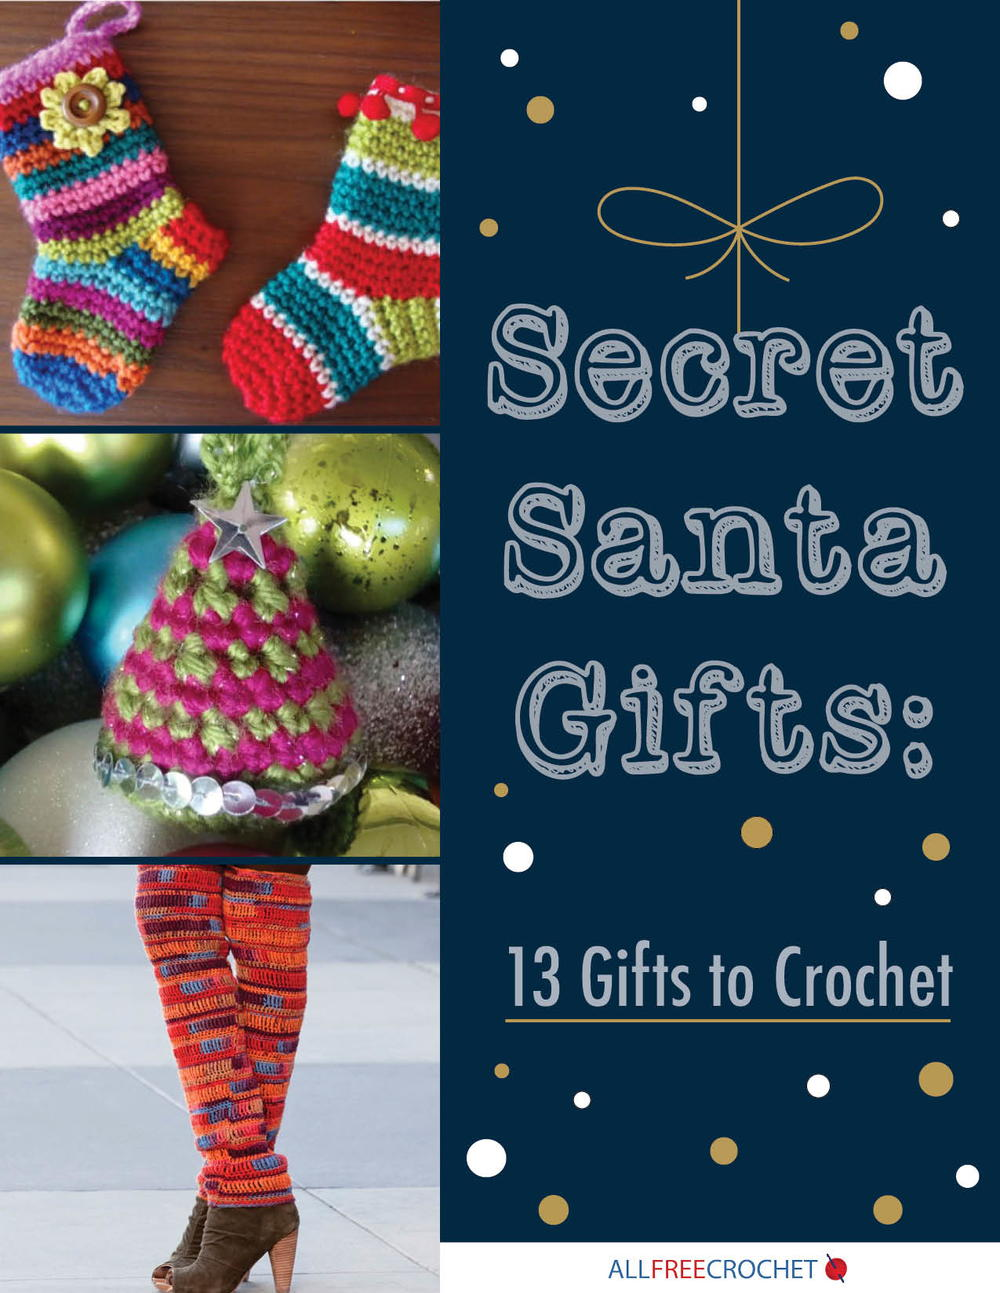 Secret Santa Gifts: 13 Gifts to Crochet   AllFreeCrochet.com